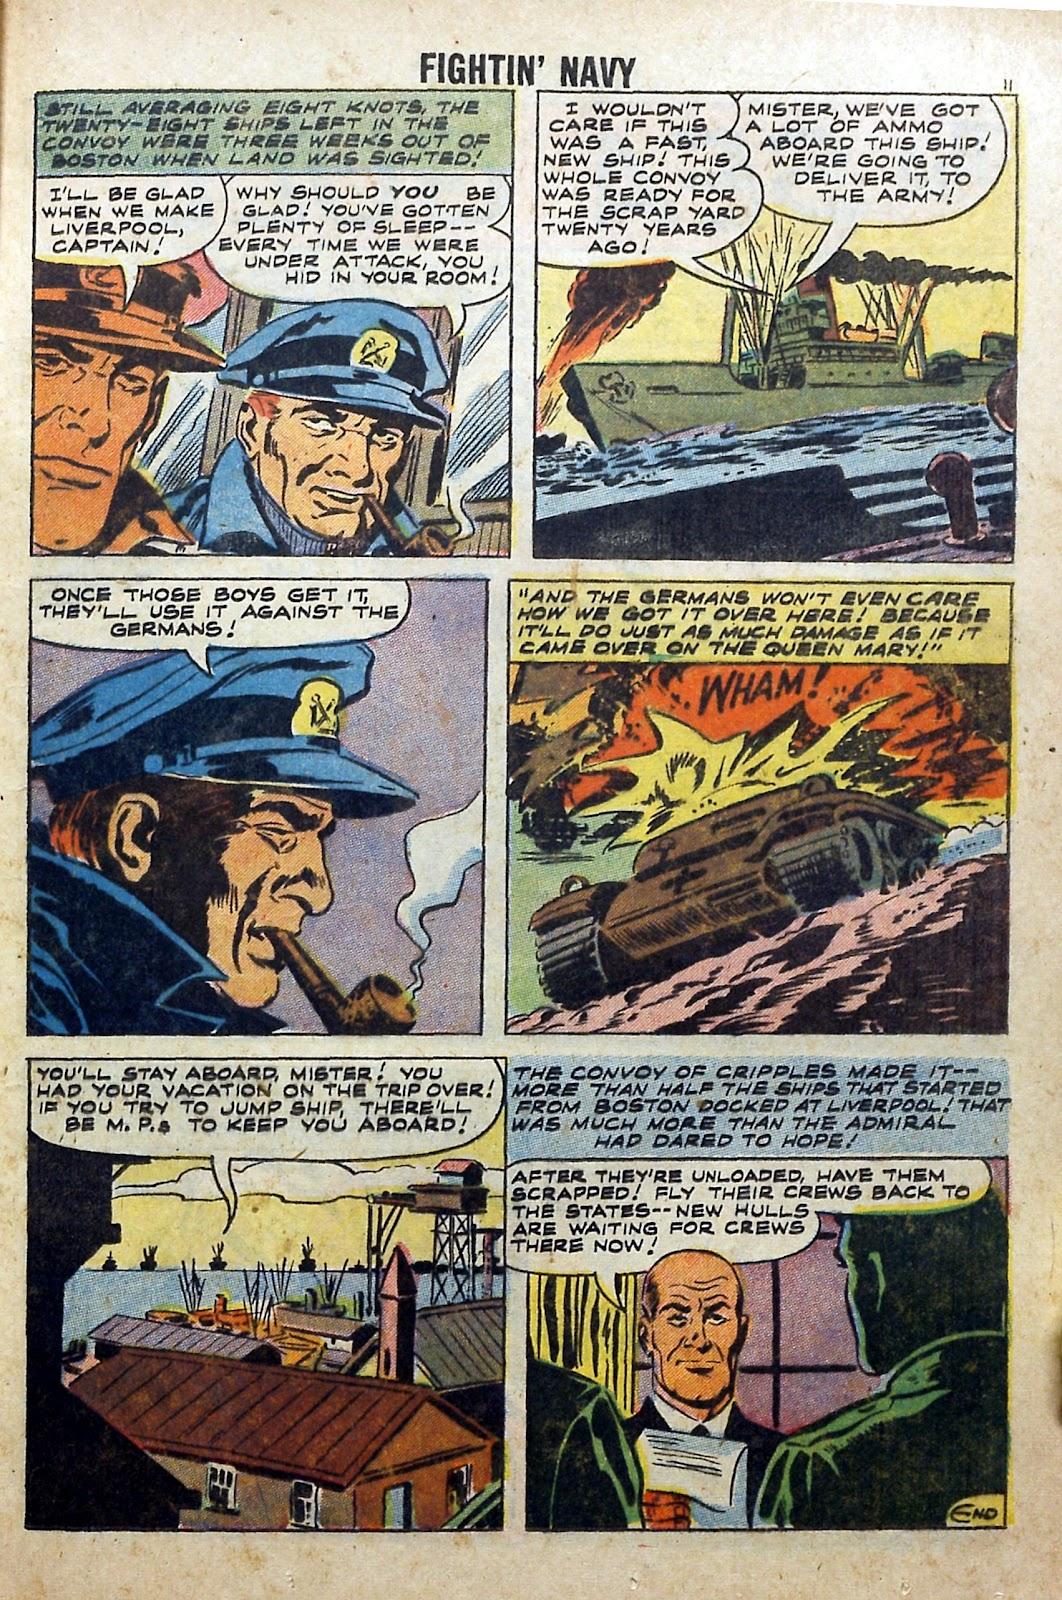 Read online Fightin' Navy comic -  Issue #84 - 13